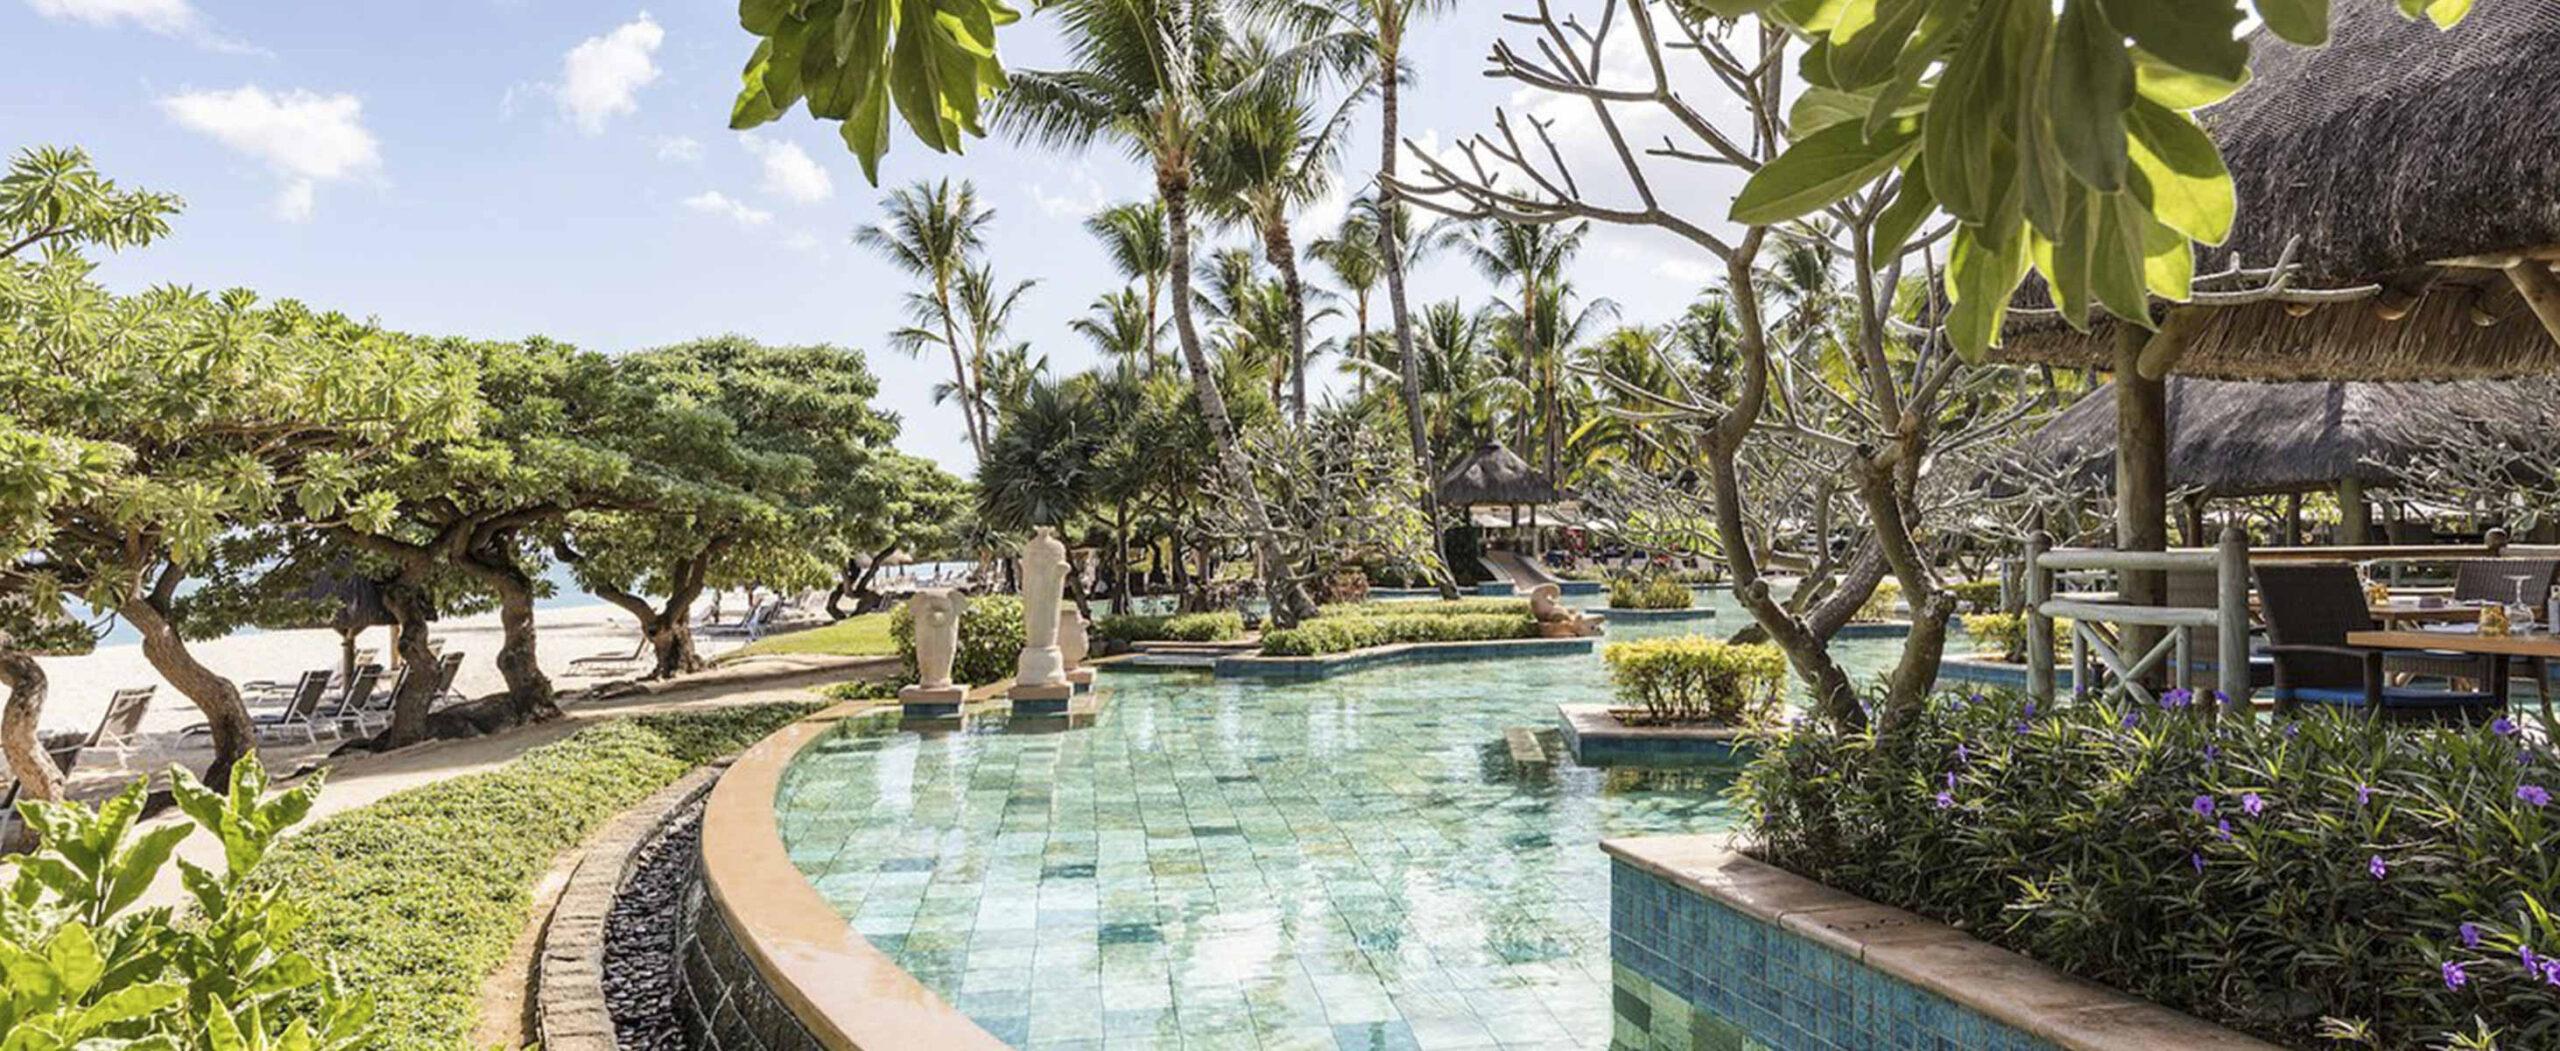 La Pirogue Mauritius   Igo Travel  Louisiana Tax Free Weekend Dates